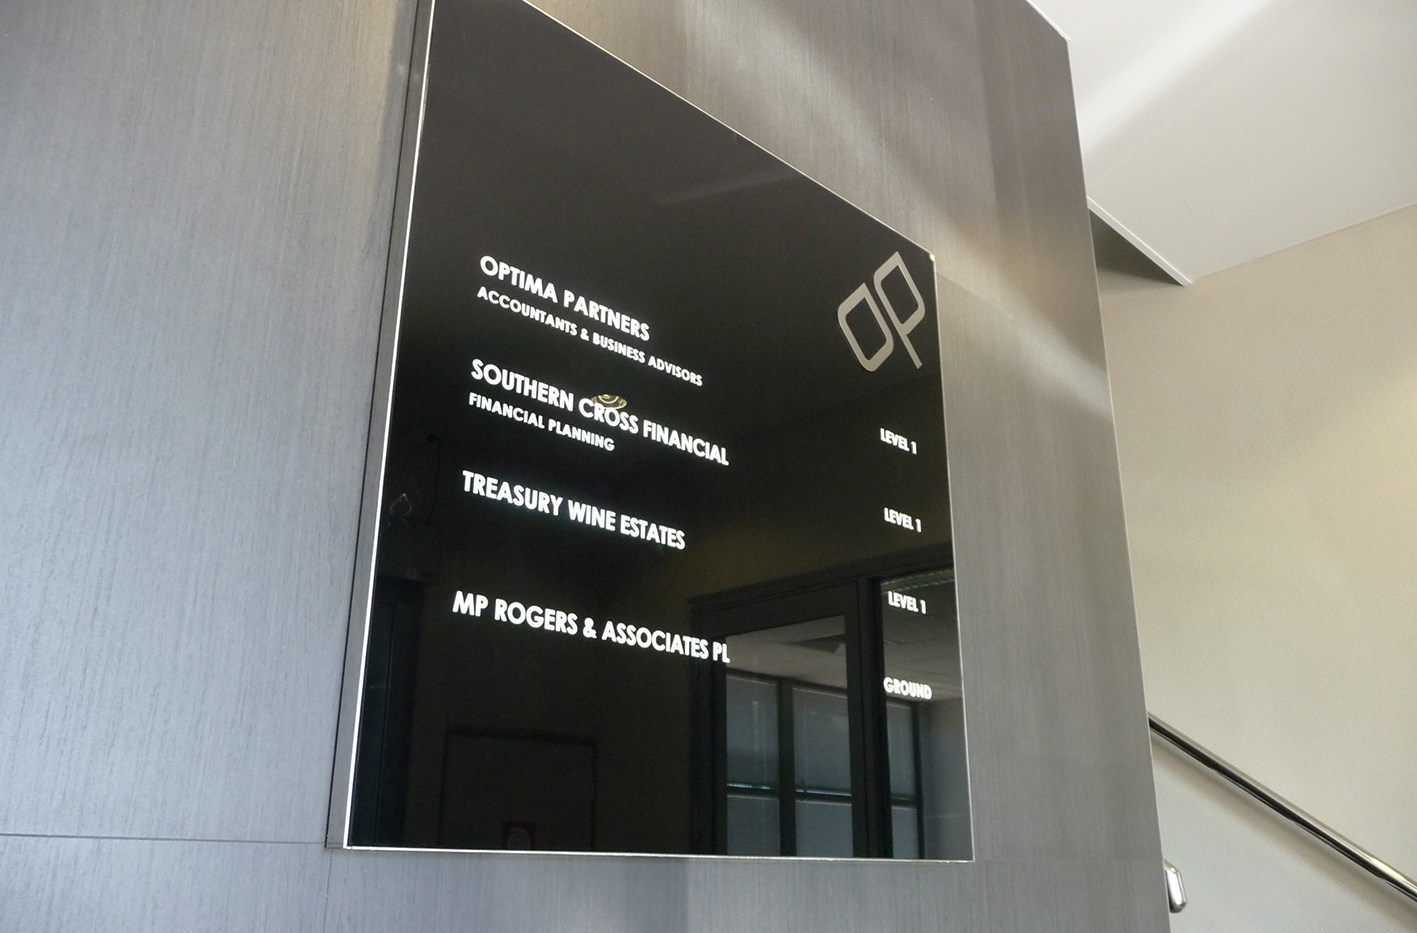 optima-directory-signage.jpg